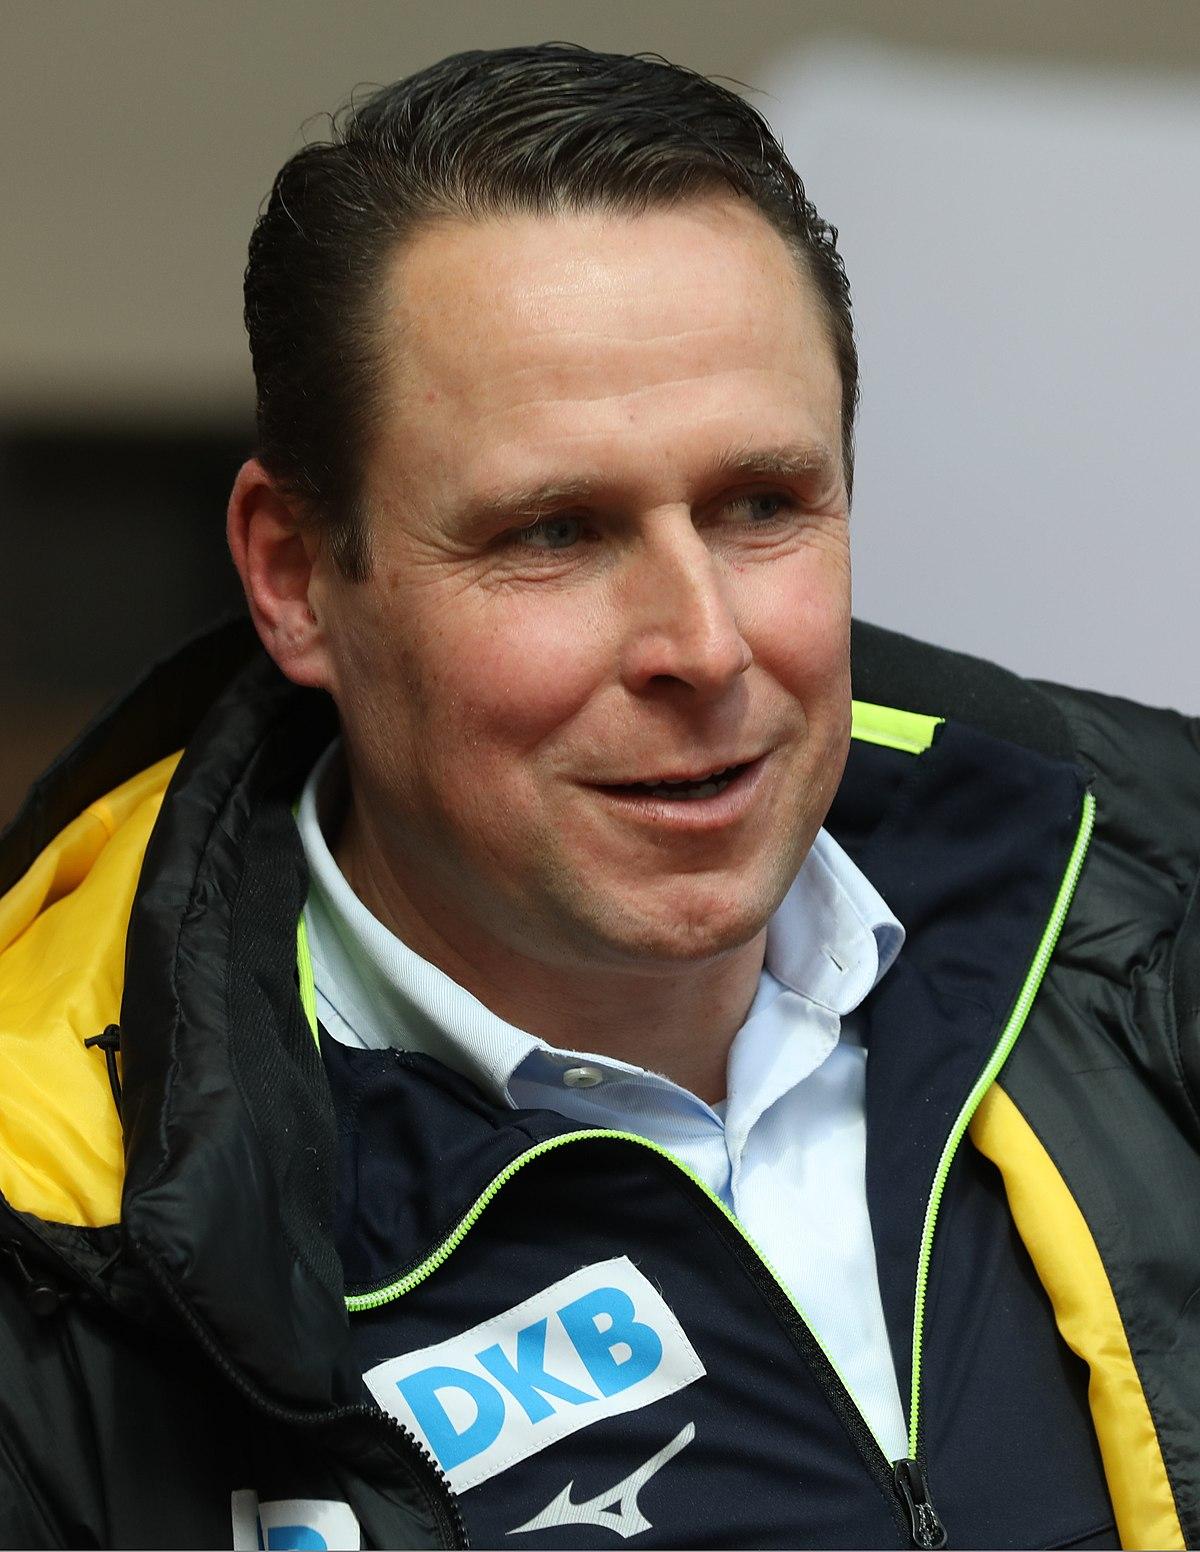 Robert Bartko